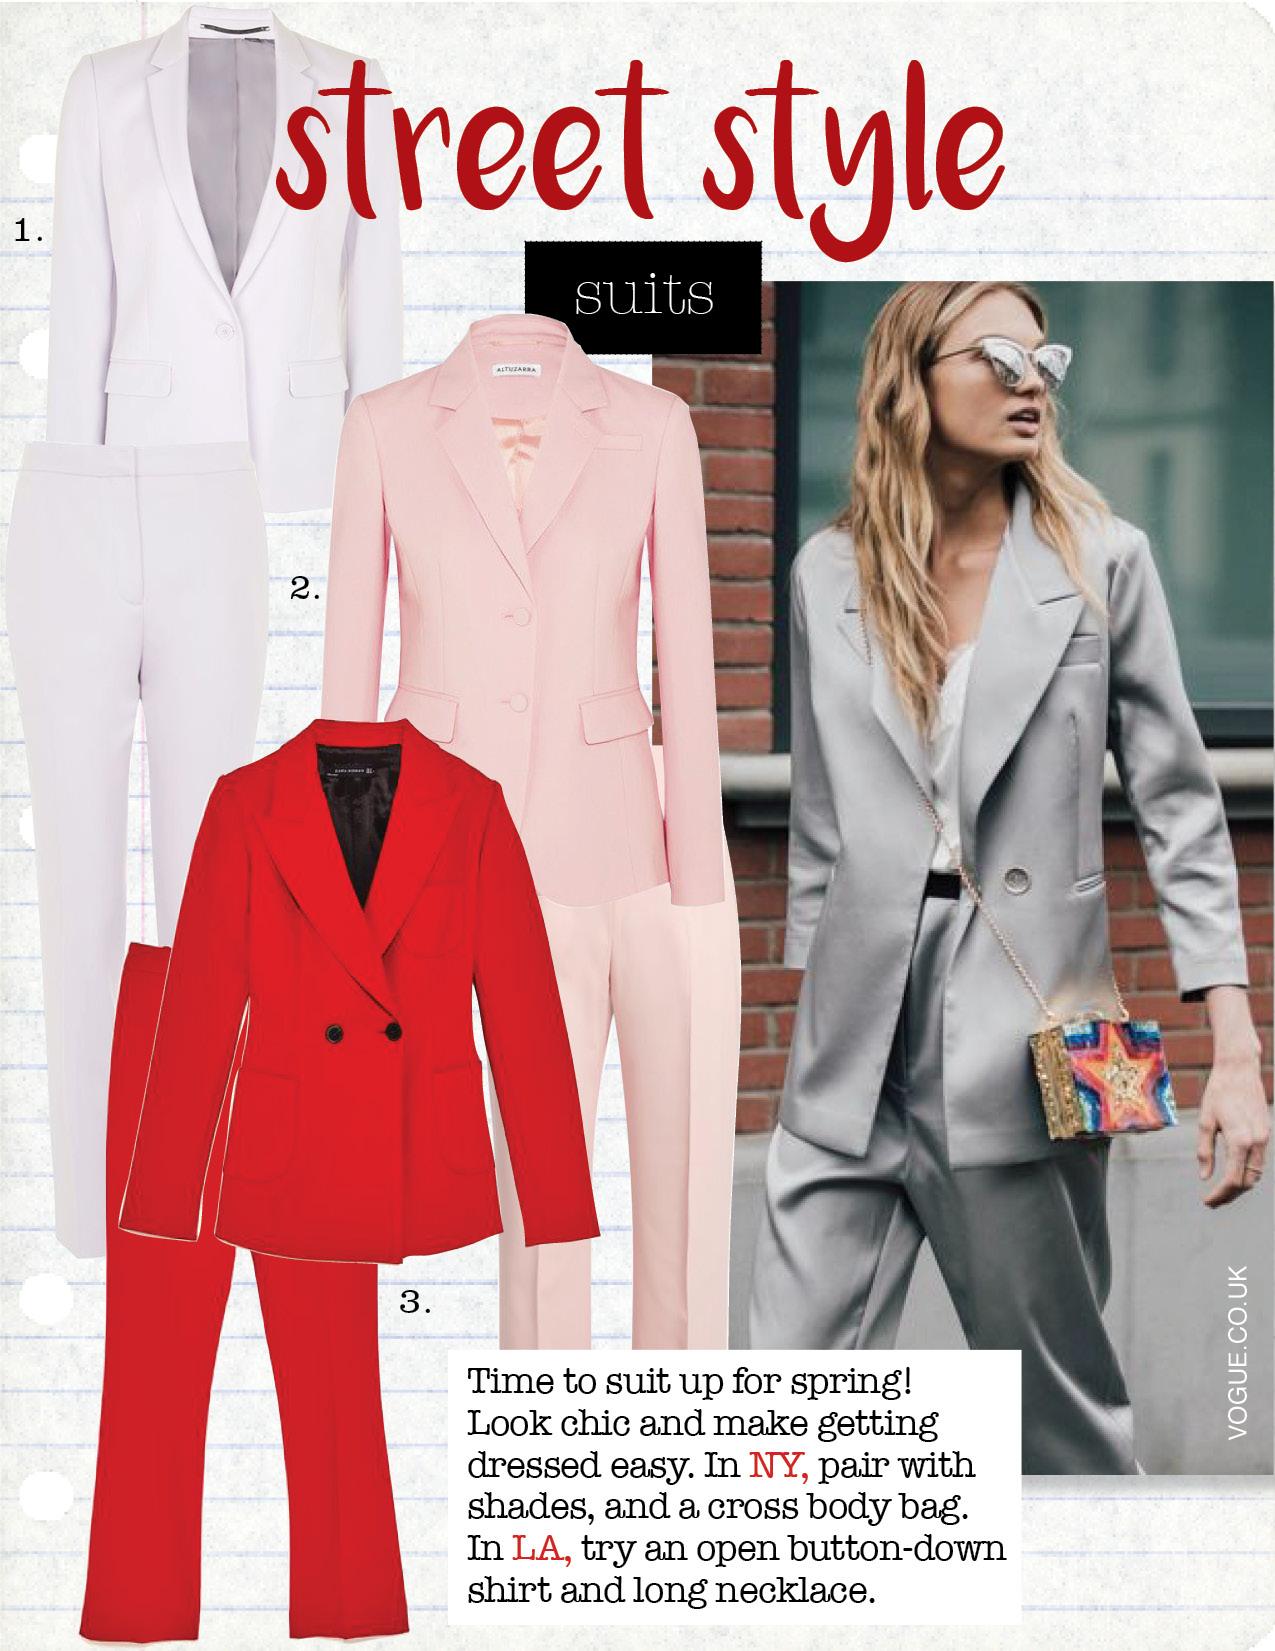 1. topshop tailored suit jacket, $125,  topshop.com  topshop tailored suit cigarette trousers, $68,  topshop.com  2. altuzarra pique blazer, $1695,  net-a-porter.com  altuzarra cropped trousers, $641,  matchesfashion.com  3. zara tailored jacket with buttons, $169,  zara.com  zara cropped straight-cut trousers, $69,  zara.com